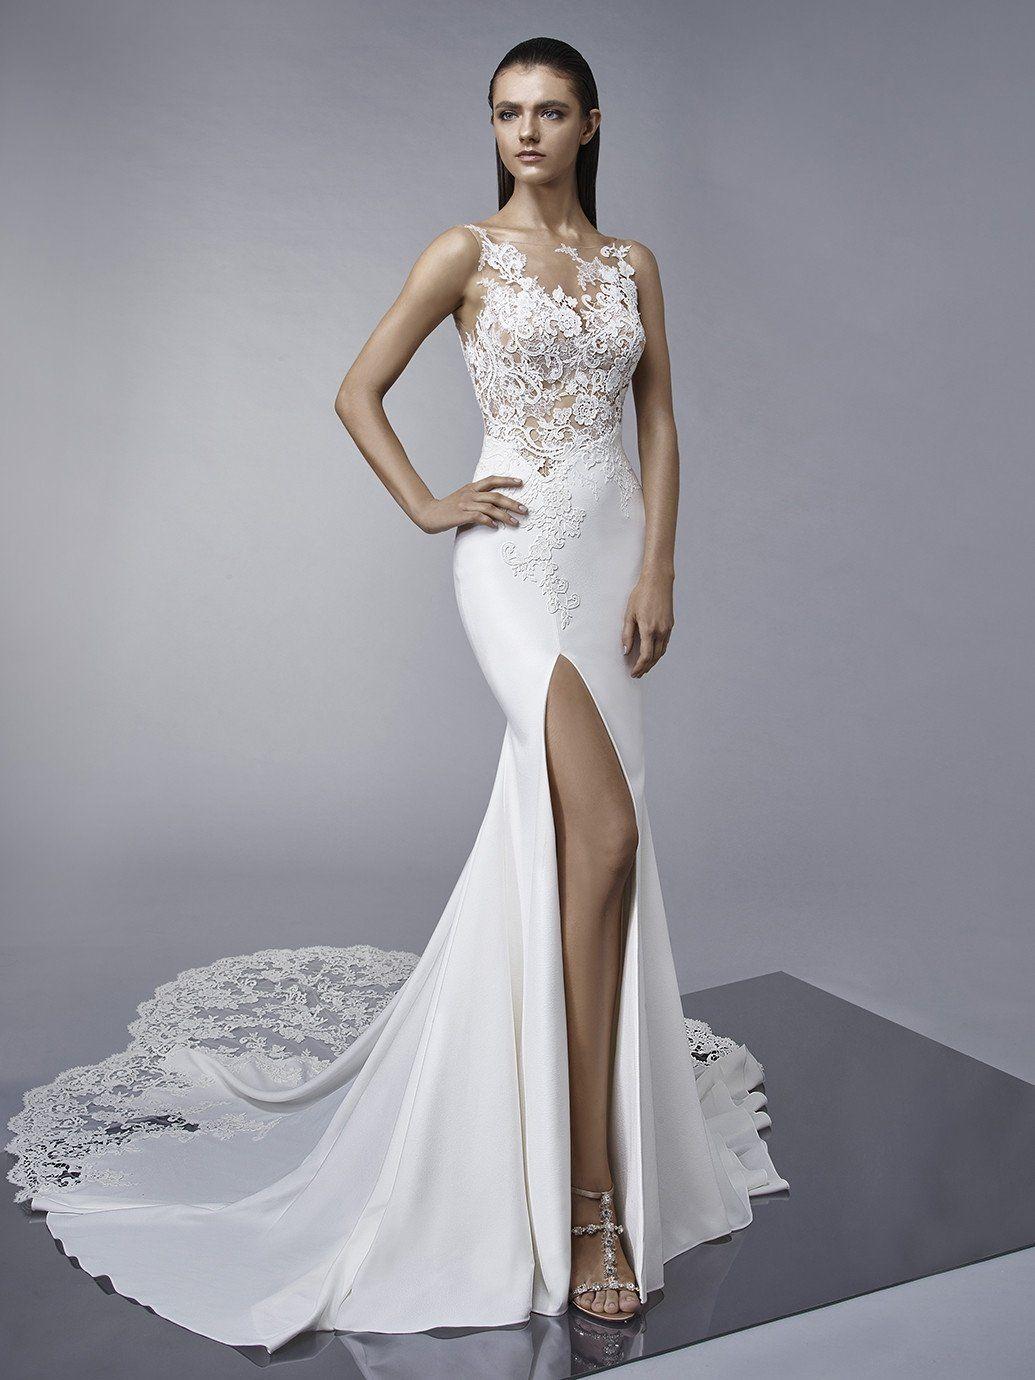 Pin On Wedding Dresses [ 1380 x 1035 Pixel ]